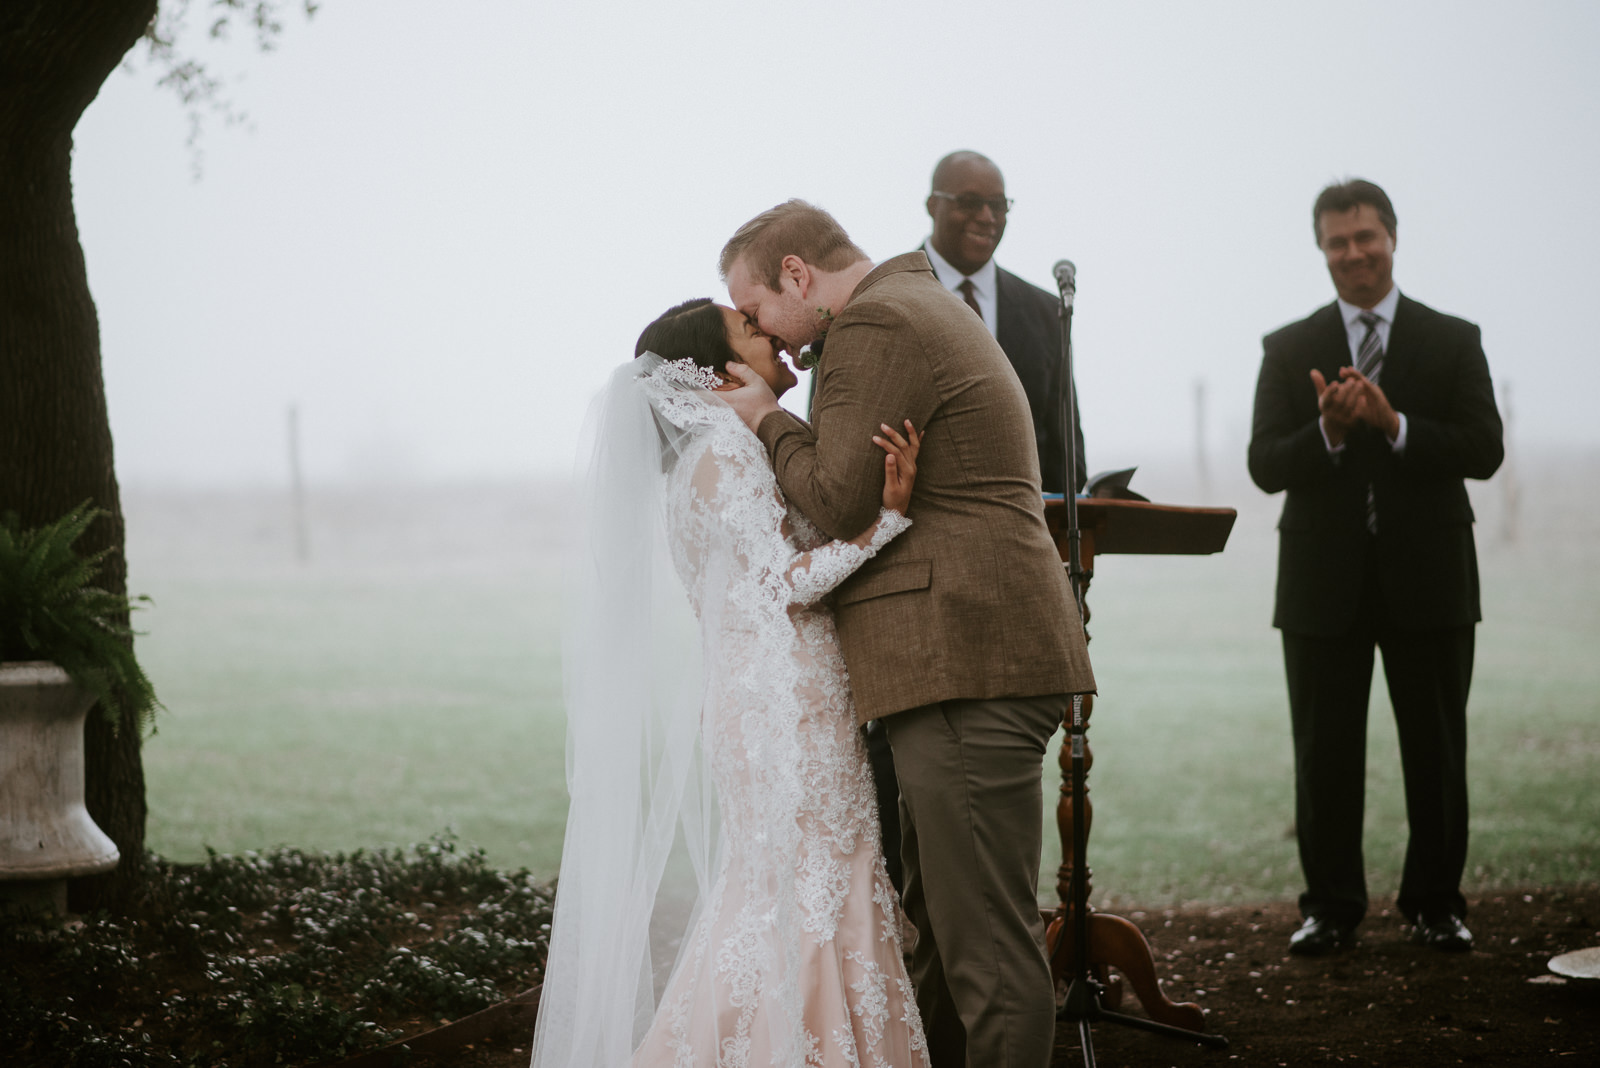 bride and groom kiss at stonehouse villa wedding ceremony